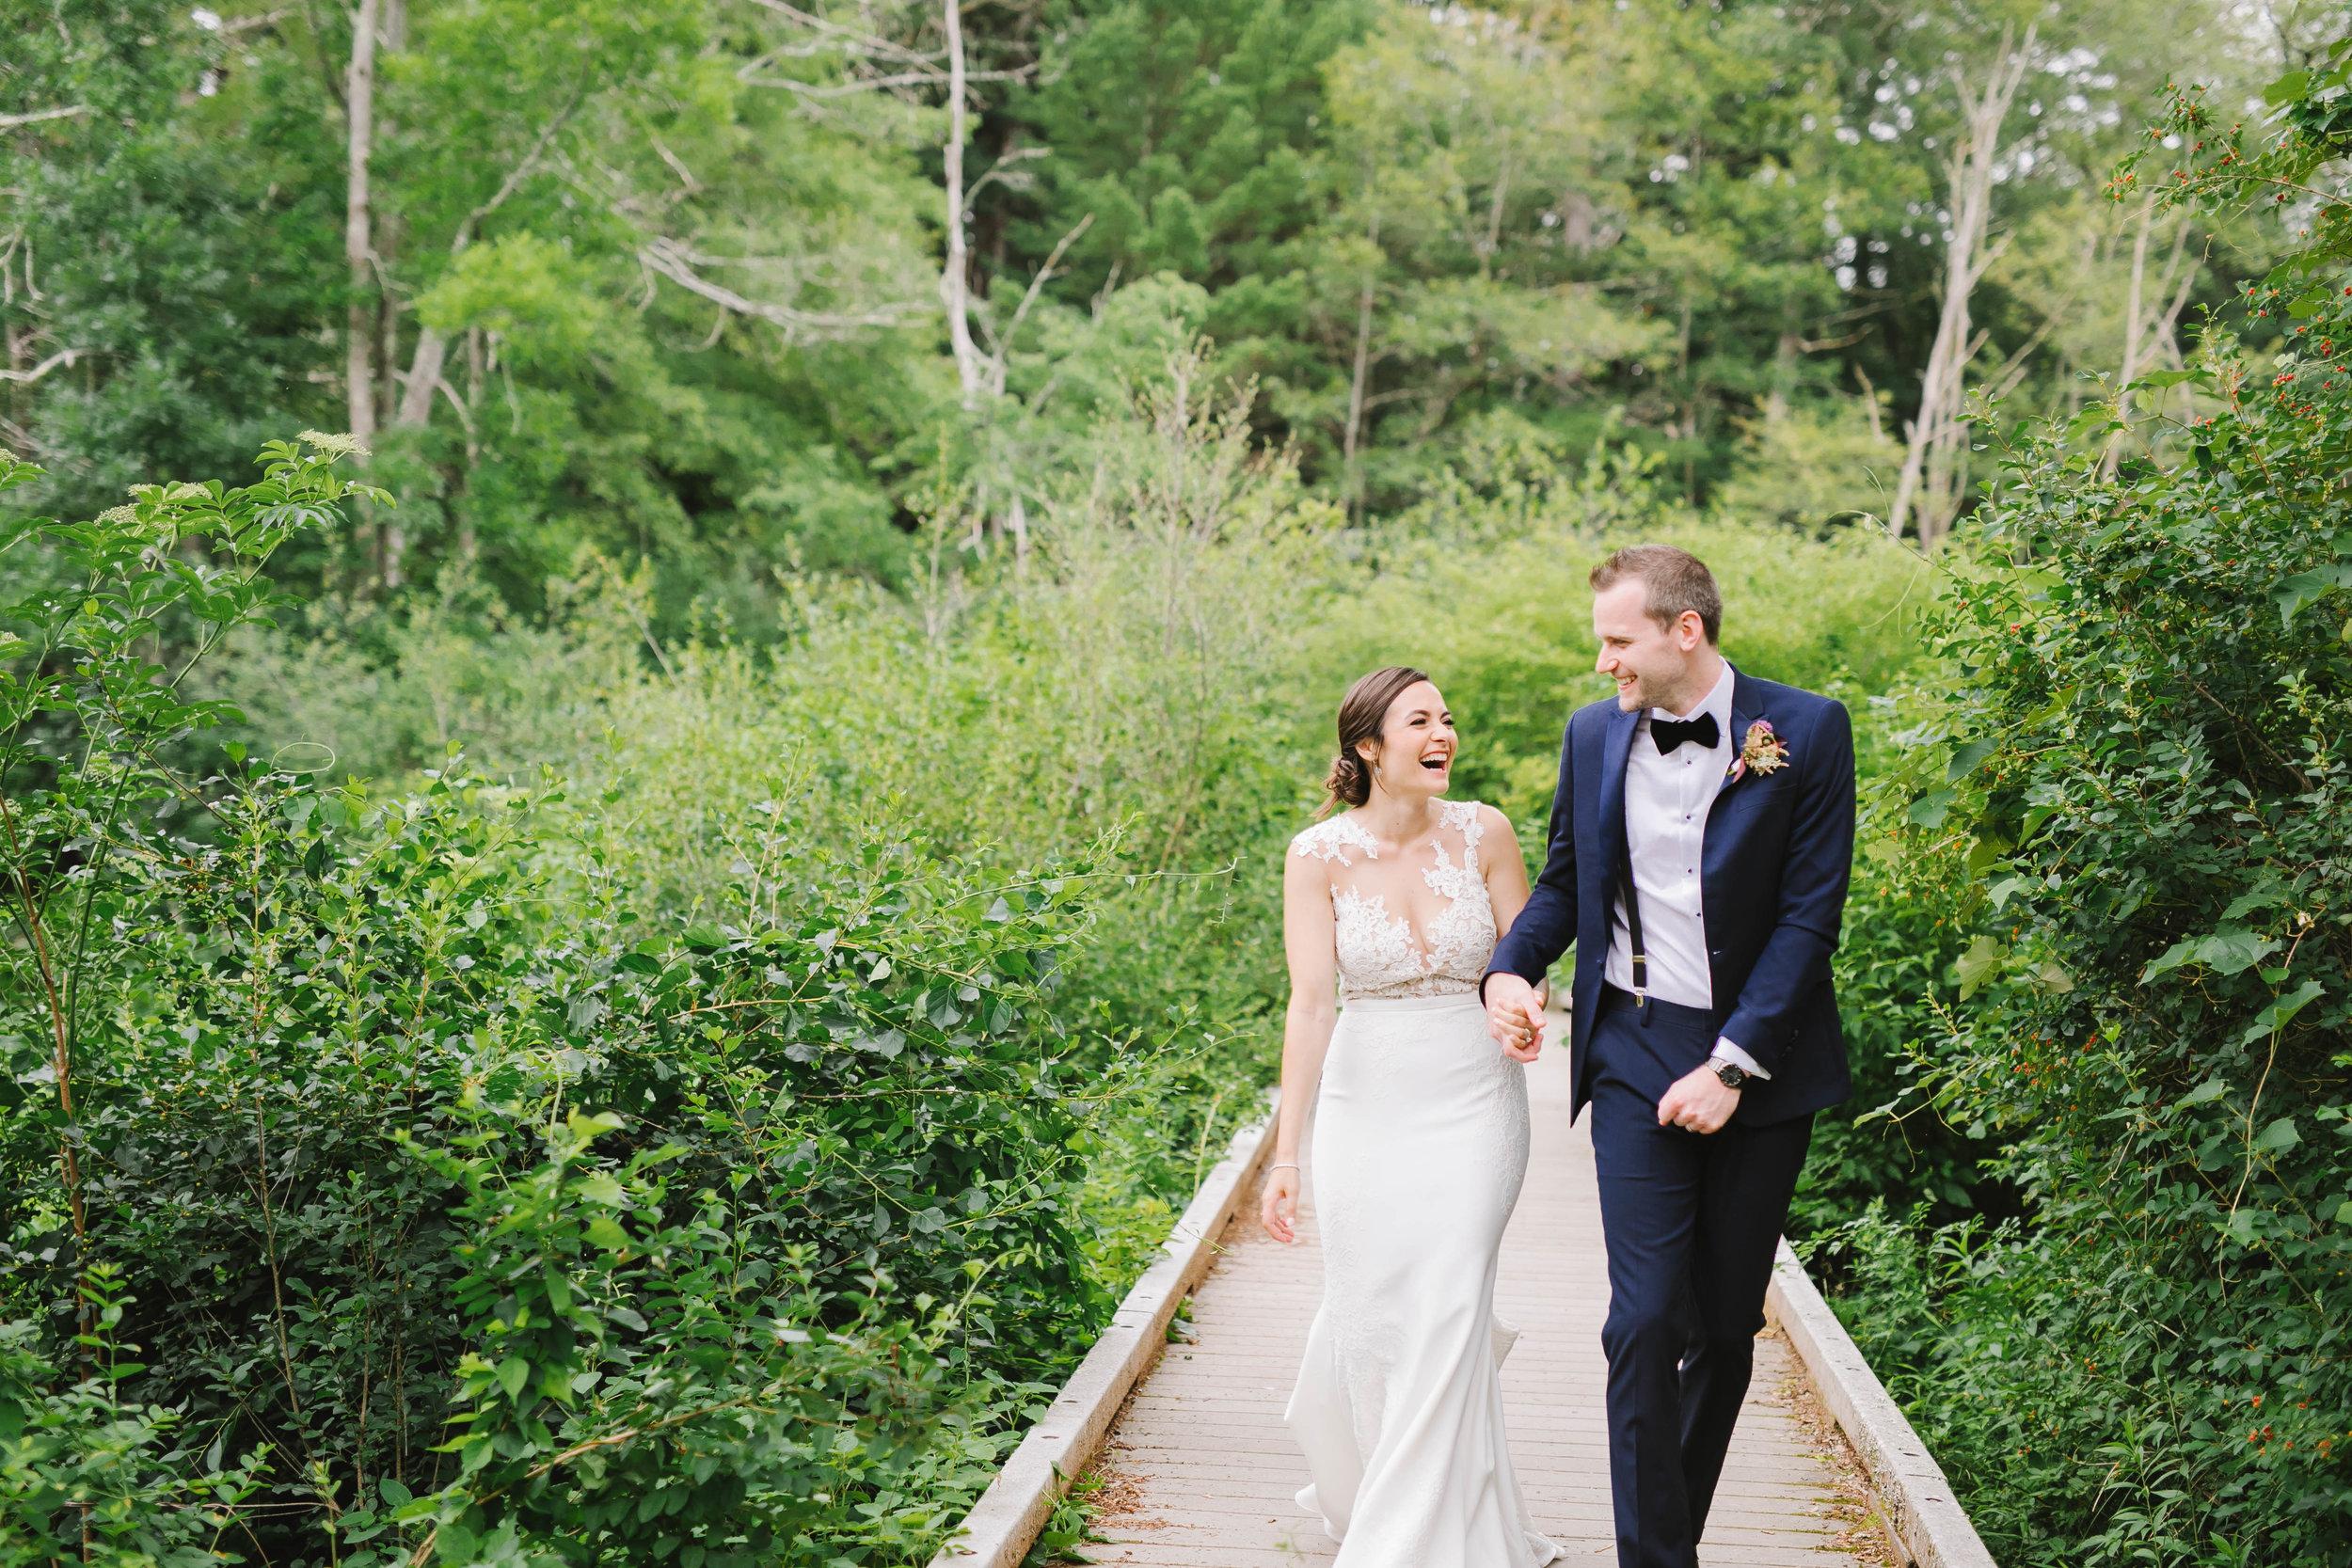 Willowdale Estate Wedding Boston Topsfield MA Italian Garden mansion house wedding - Emily Tebbetts photography-26.jpg